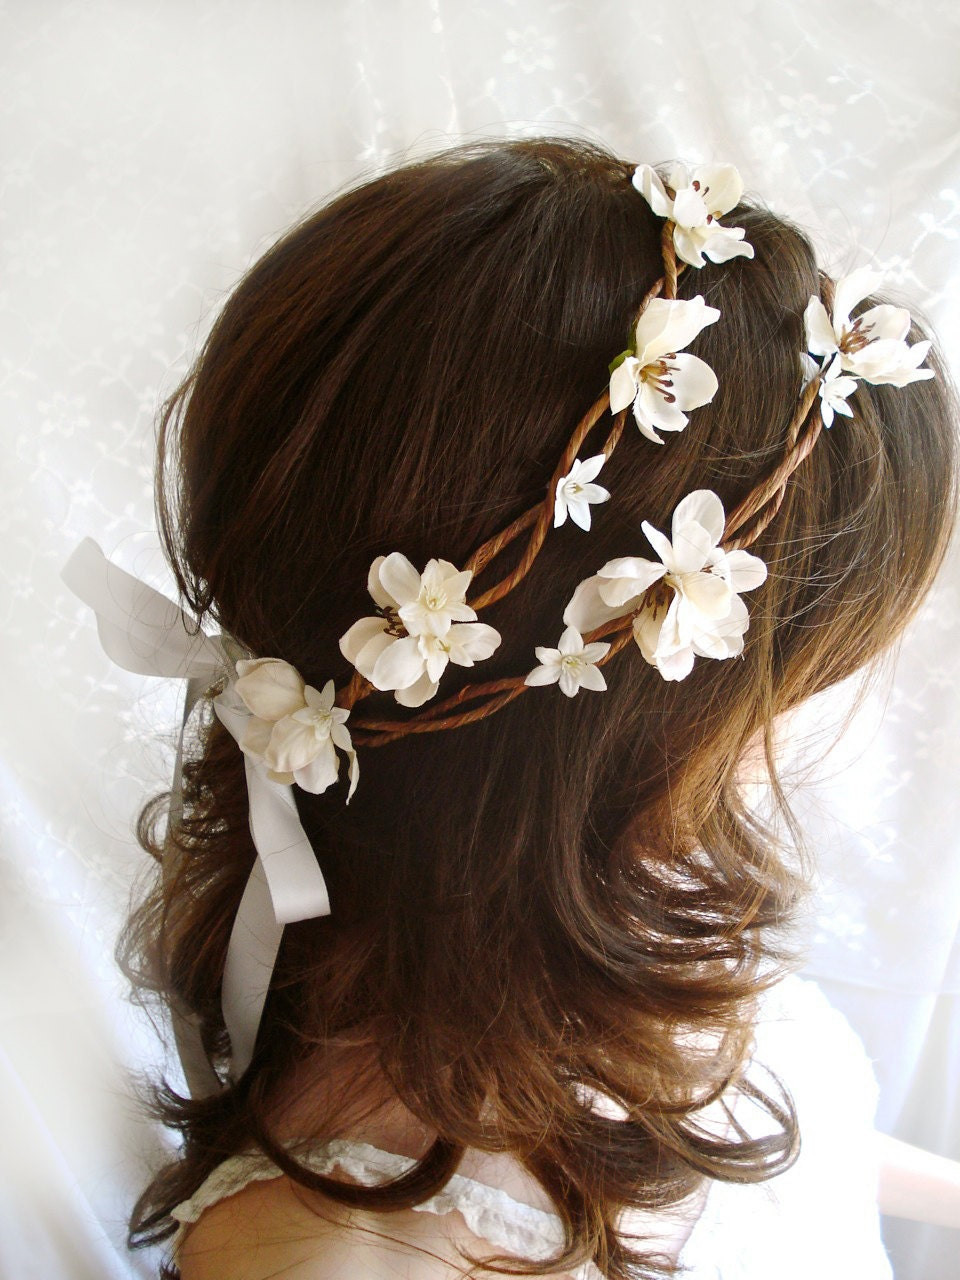 Bridal Flower Wreath For Hair : Rustic chic wedding head wreath bo peep ivory flower hair